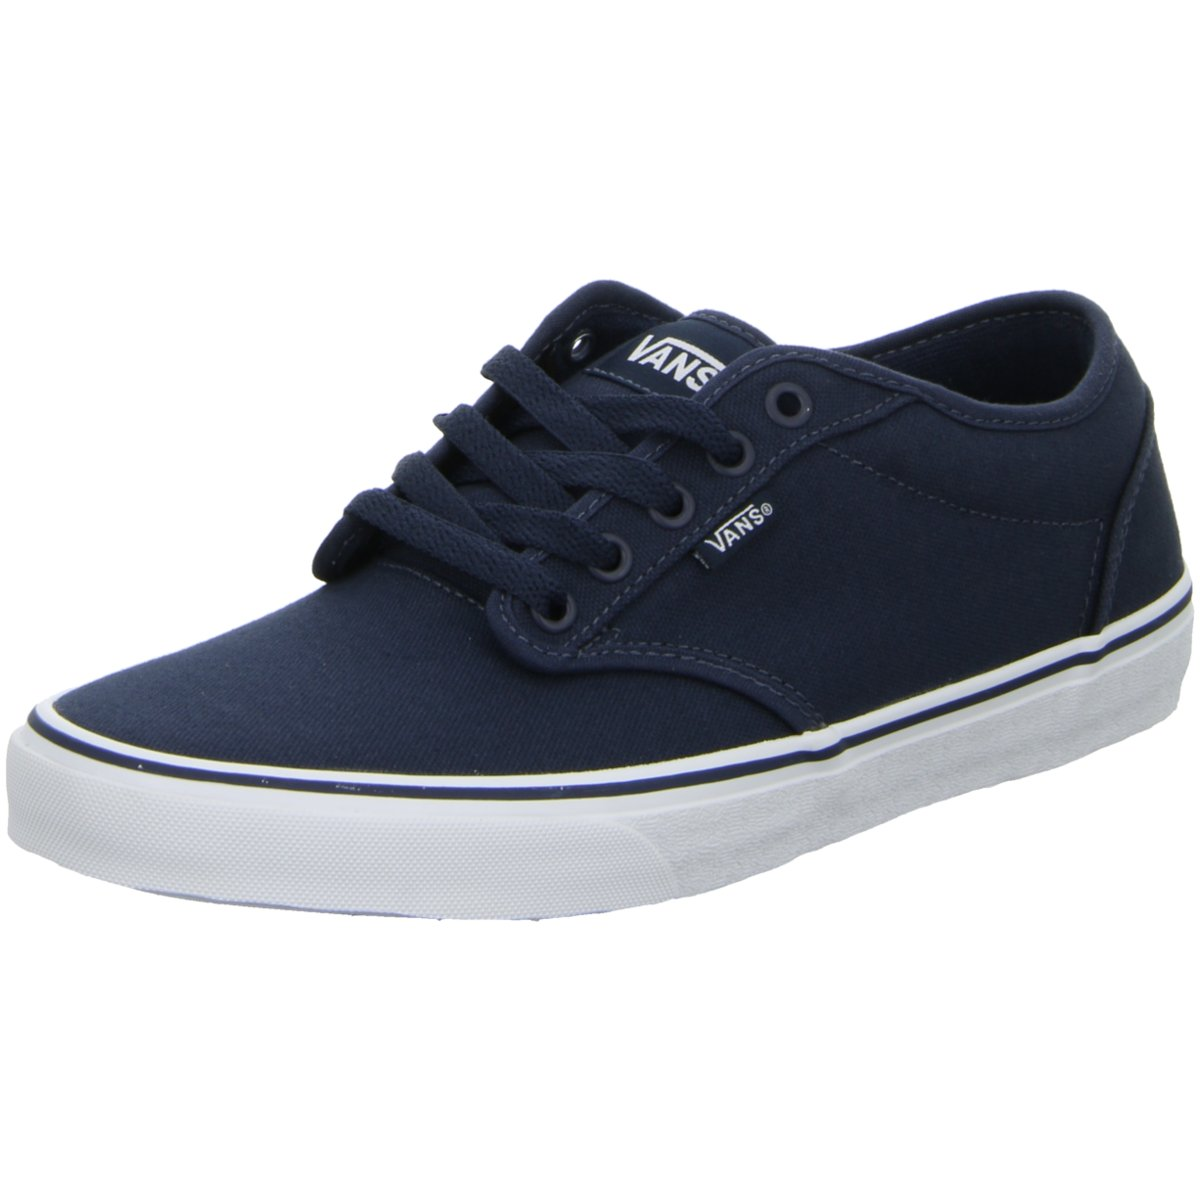 NEU Vans Herren Sneaker Leinen Schnürhalbschuh Atwood VN000KC44K1 blau 132452